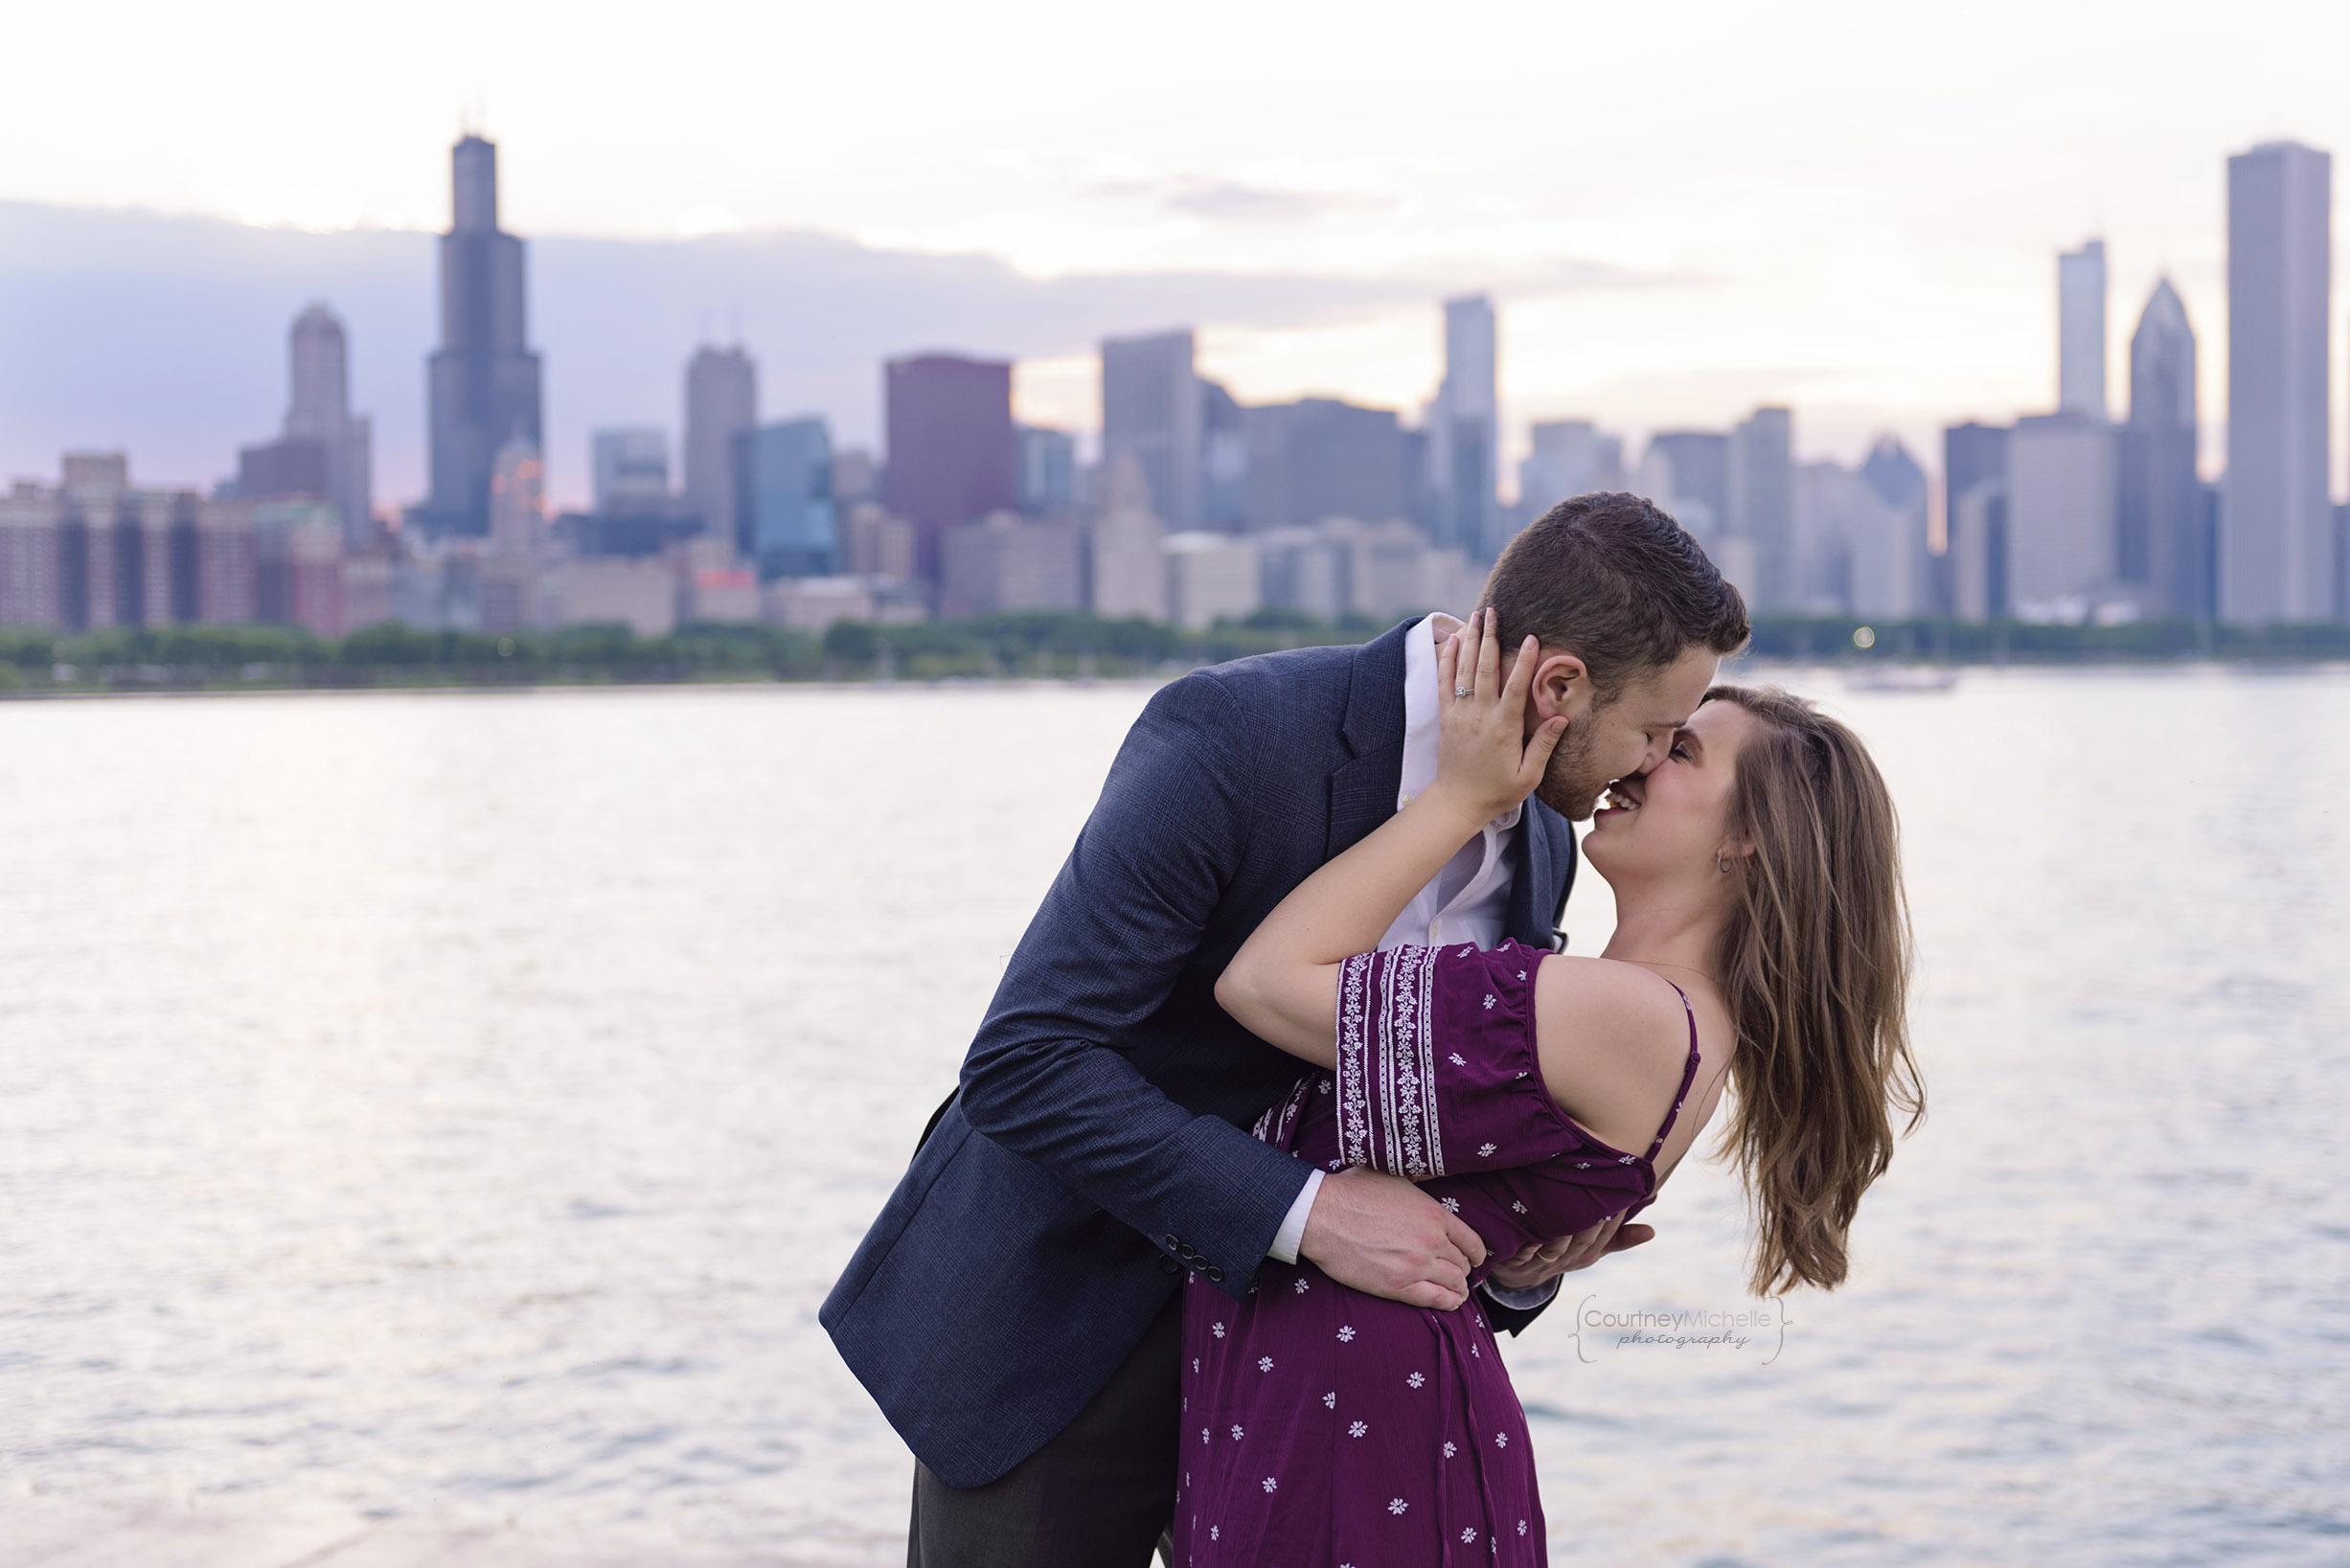 chicago-engagement-skyline-at-sunset-adler-planetarium-engagement-photography-by-courtney-laper.jpg